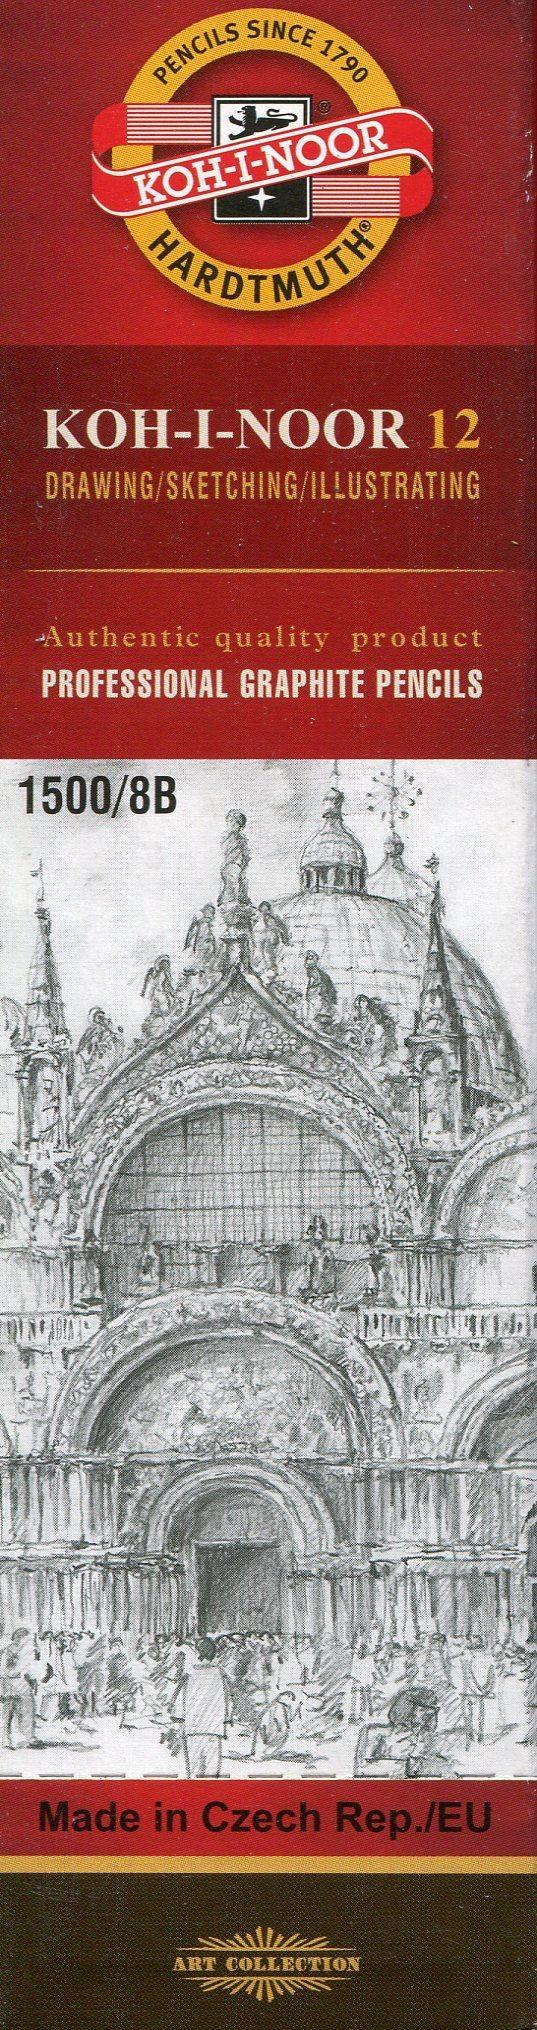 Koh-I-Noor Koh-I-Noor Ołówek grafitowy 1500/8B 12 szt